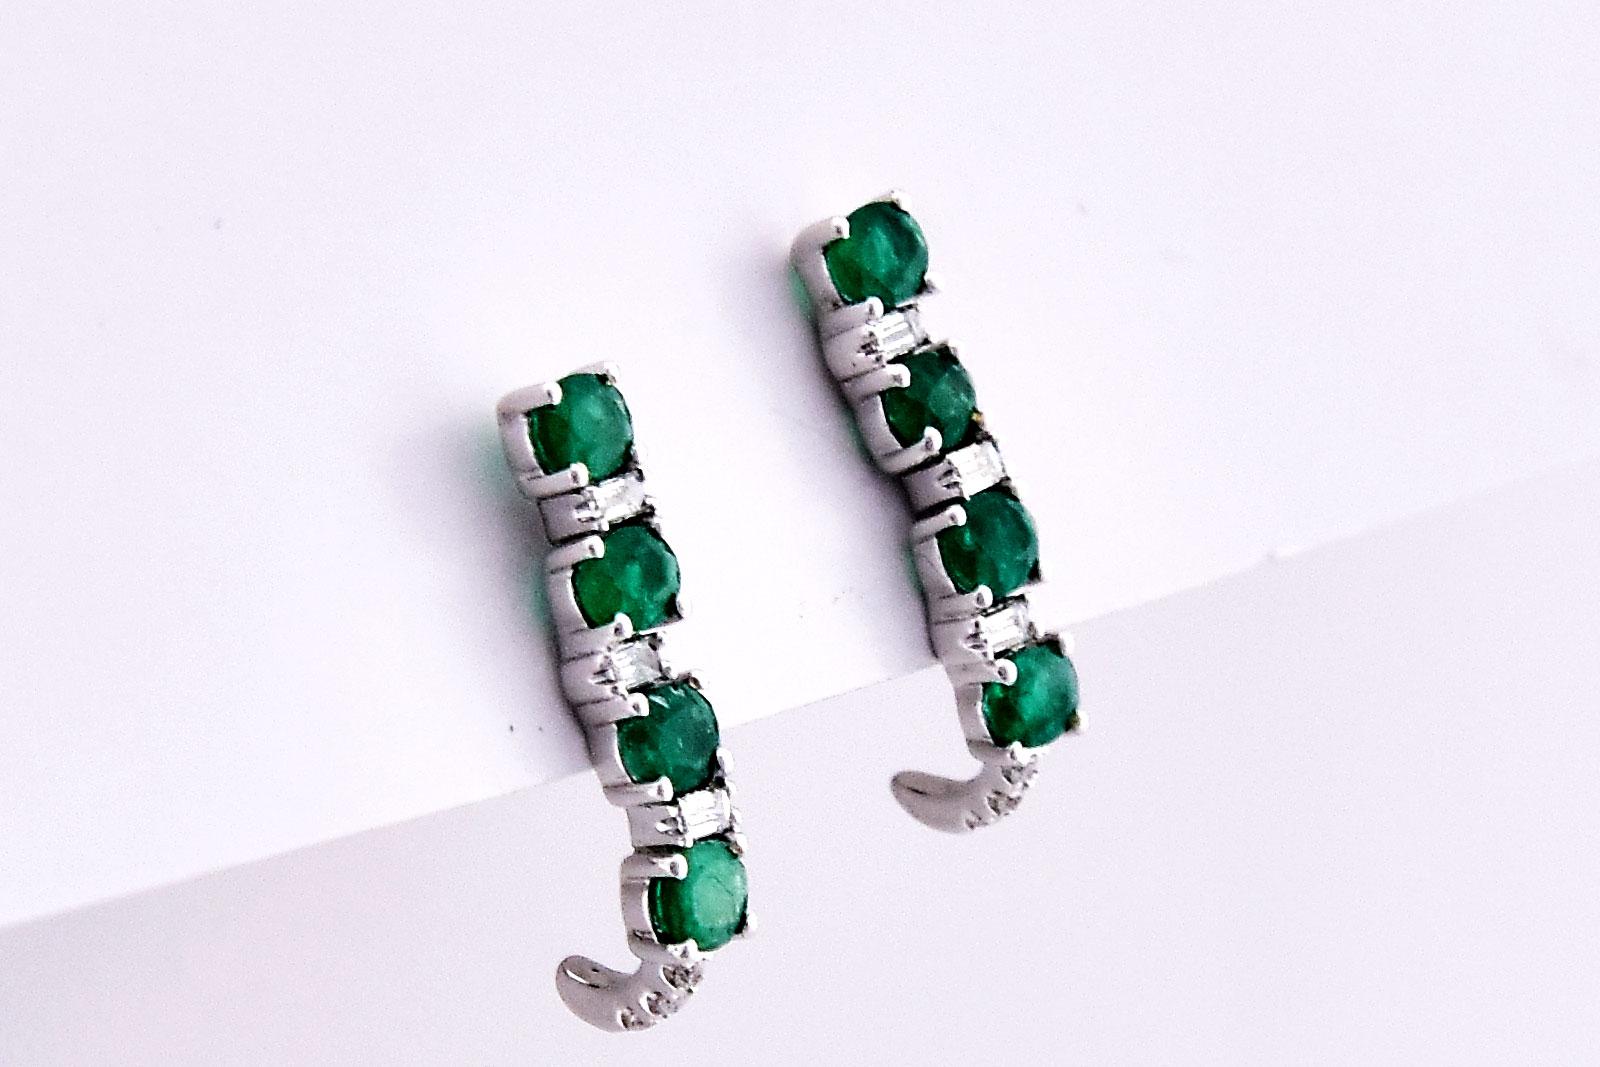 1 Carat Total Weight Emerald Diamond Earrings